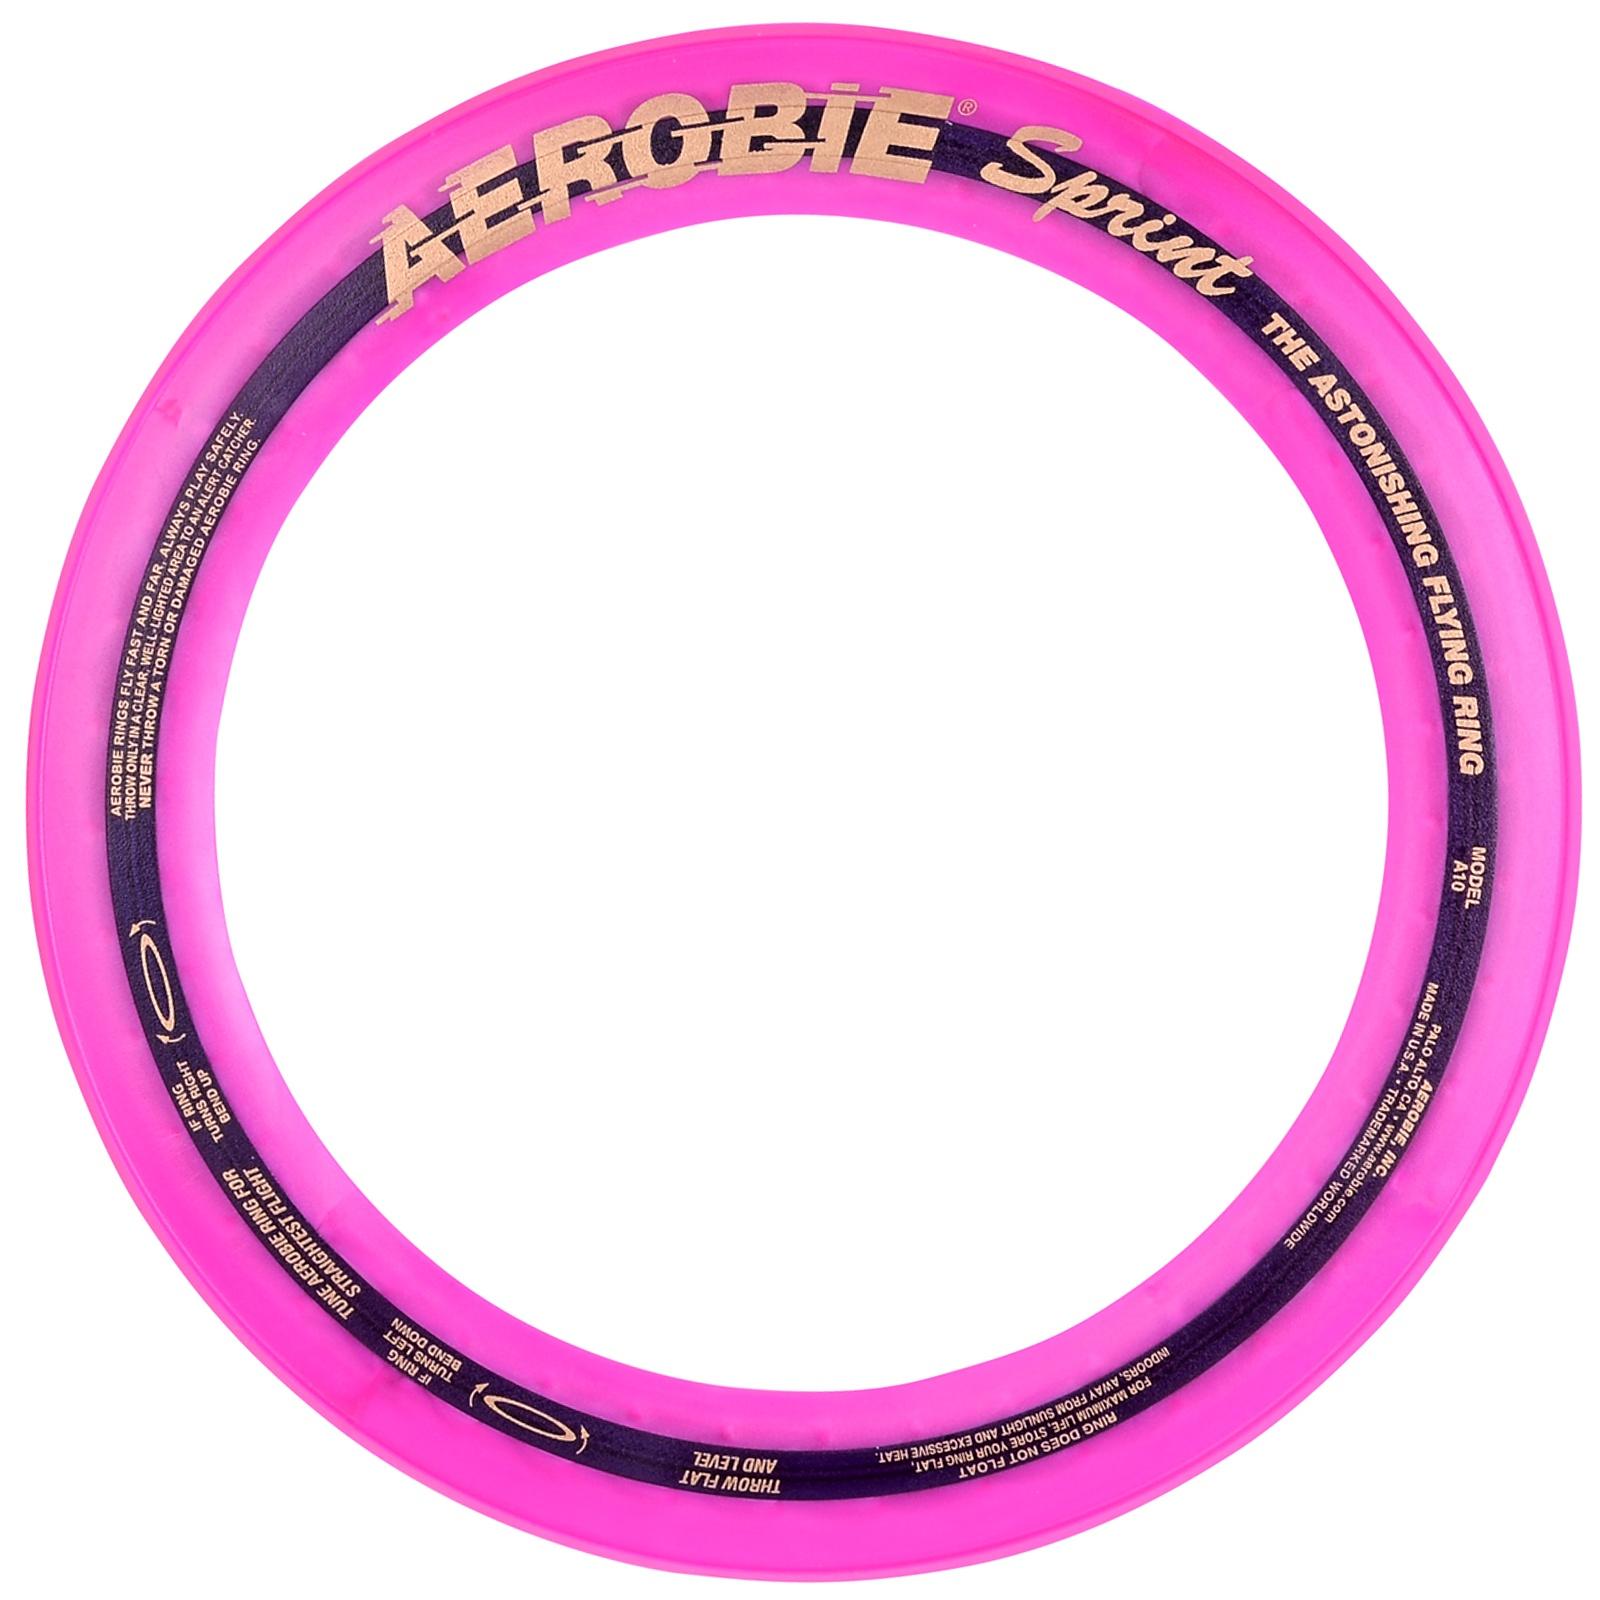 Létající kruh AEROBIE Sprint fialový